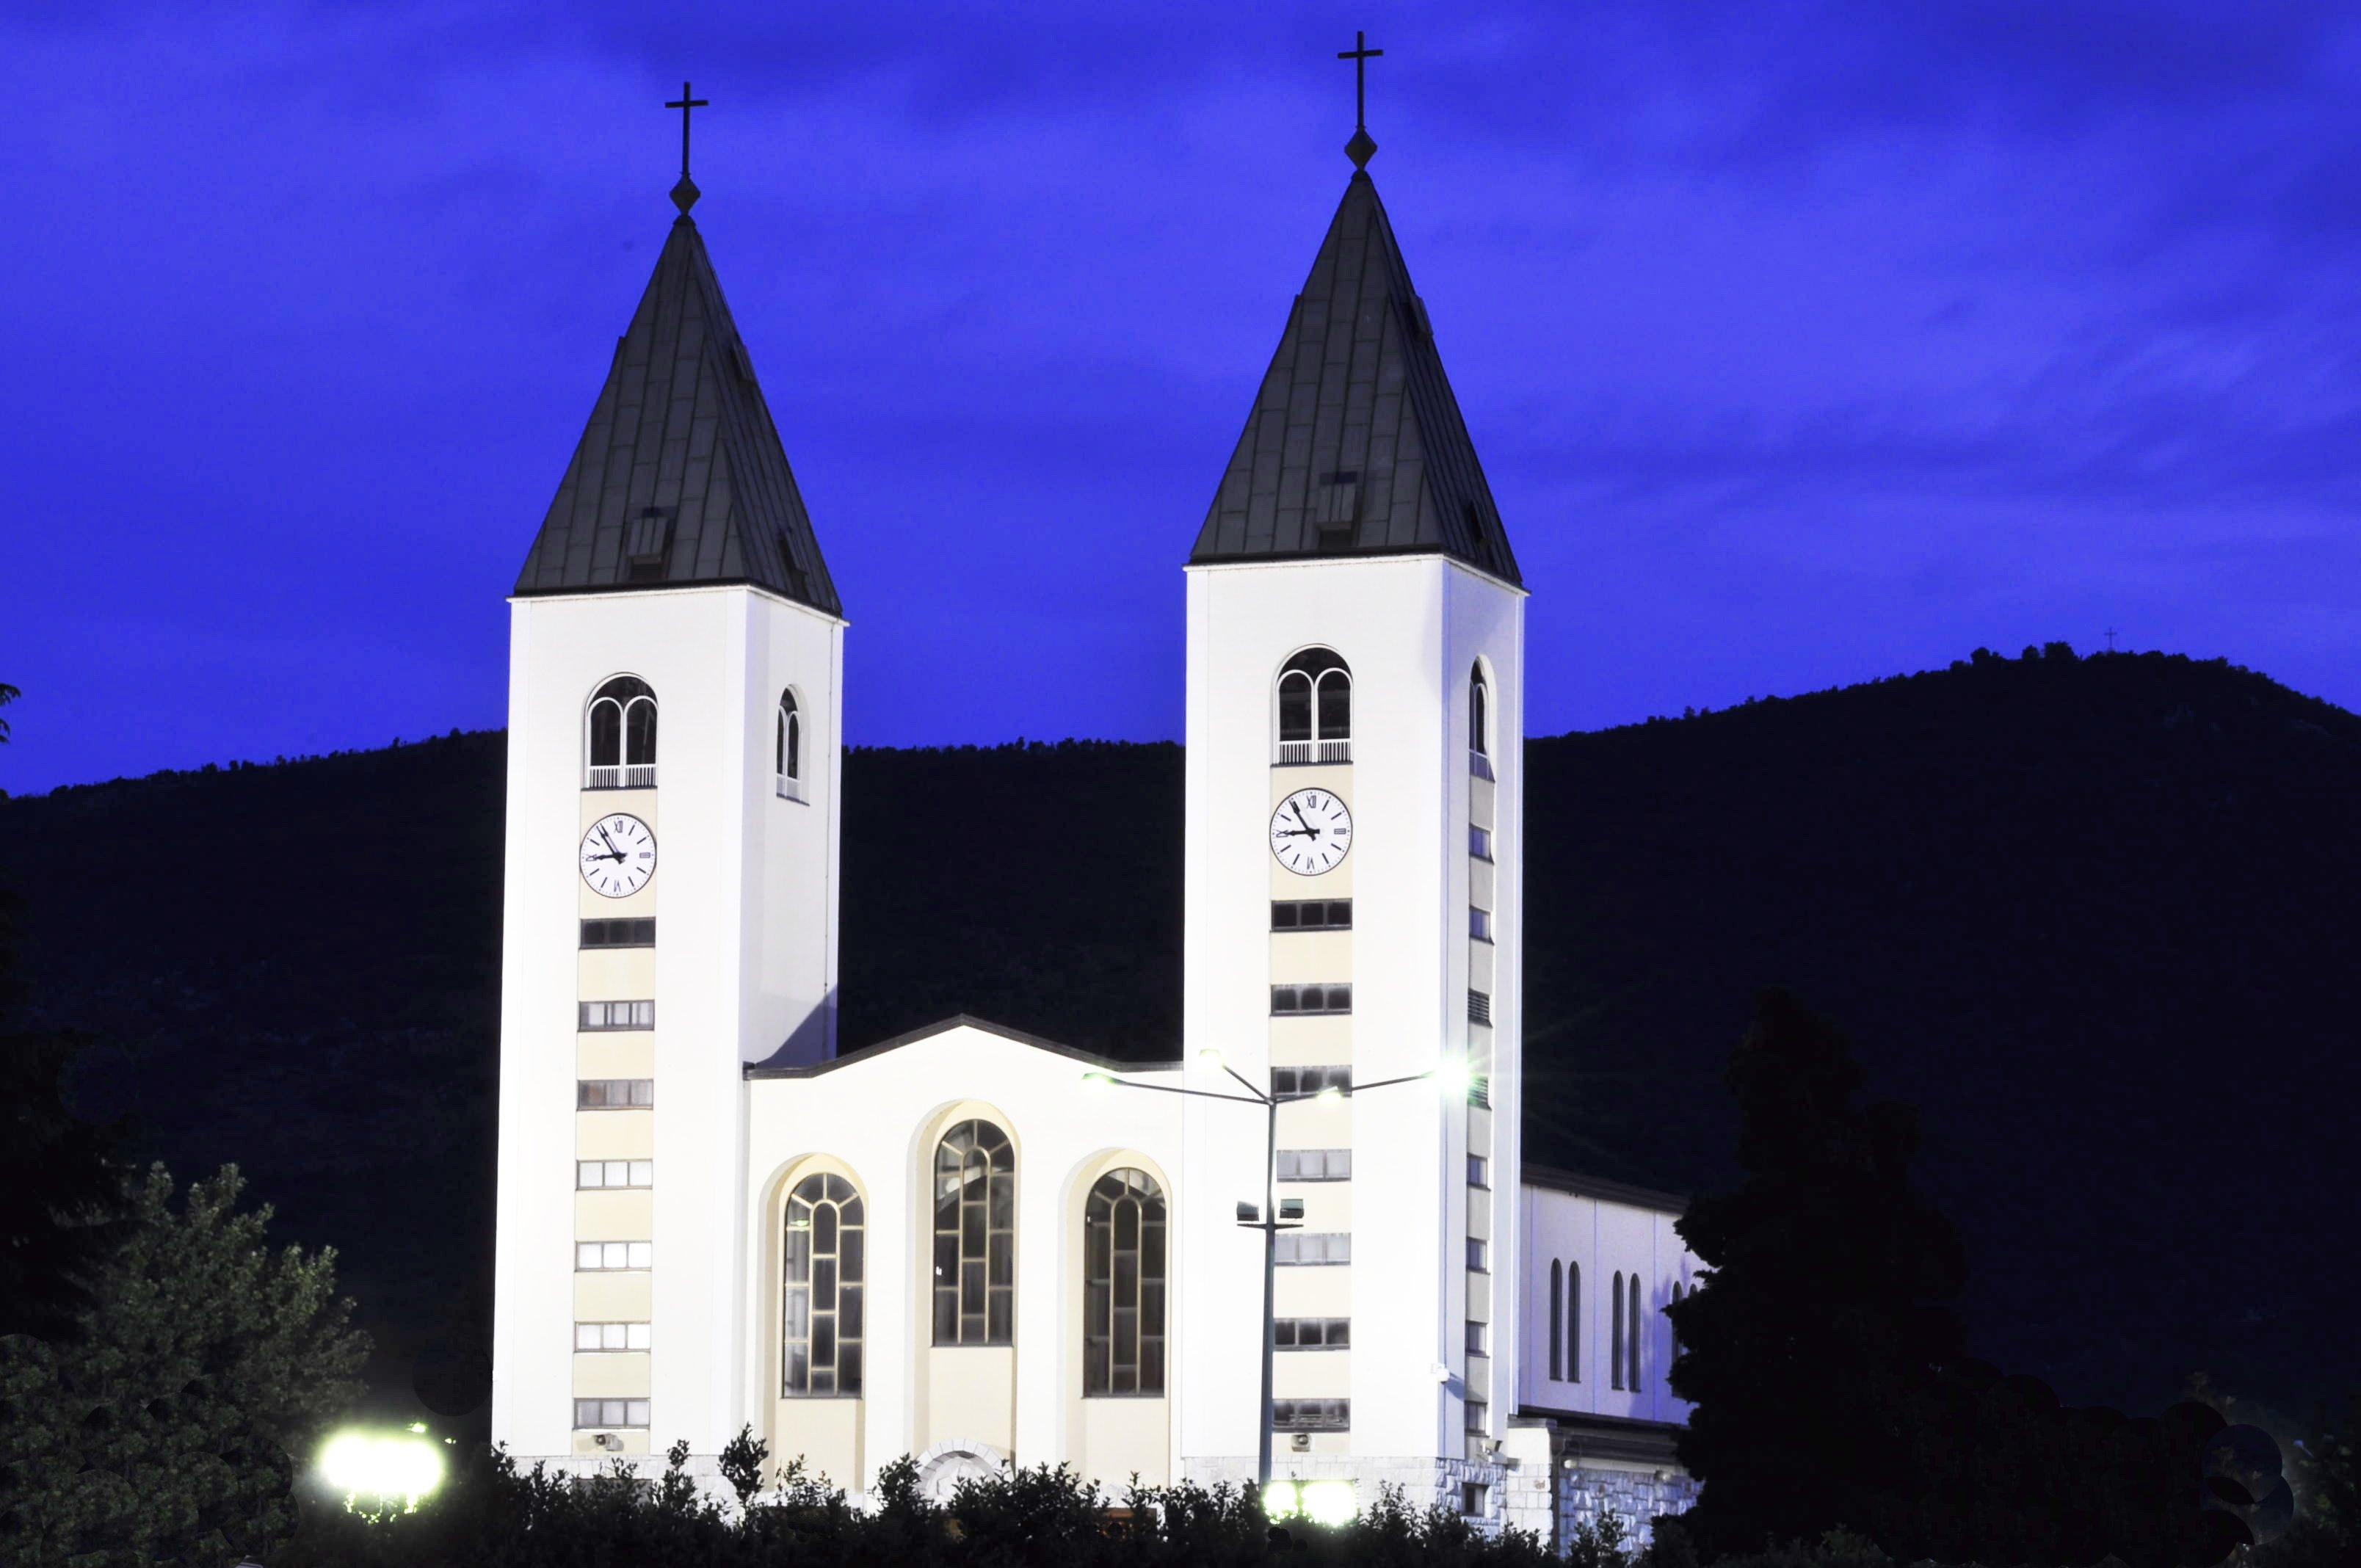 Saint james parish church (st. jakov) medjugorje - hotel pansion porta - bosnia herzegovina - creative commons by gnuckx photo